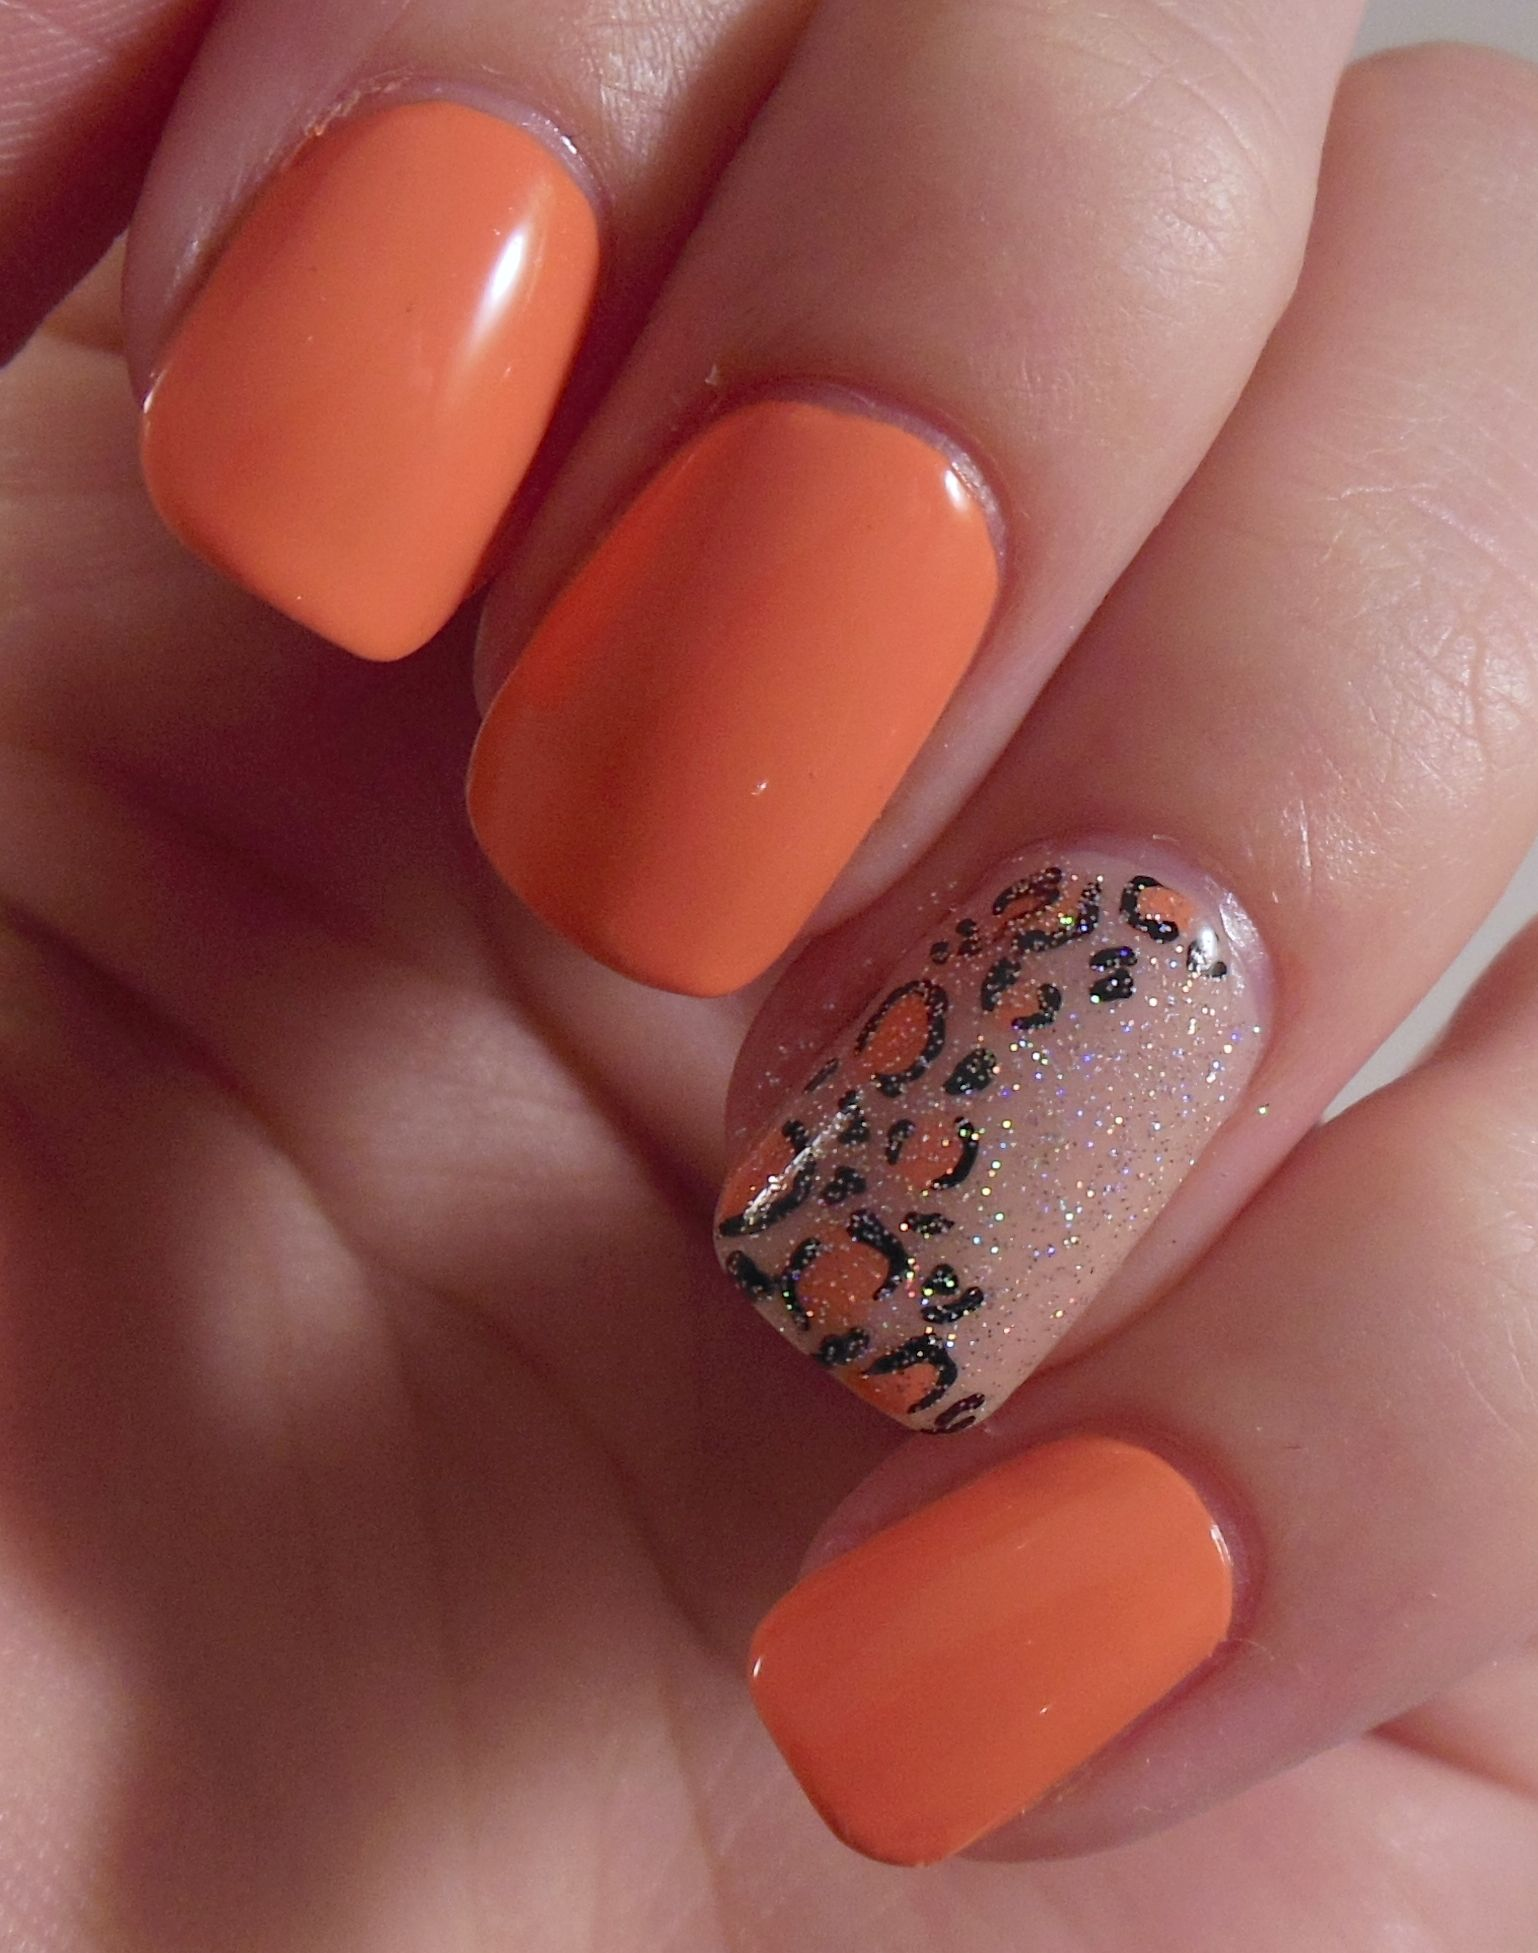 Peach And Black Nail Designs - British Nail Bloggers - Colour Me Crazy - Orange My Nails